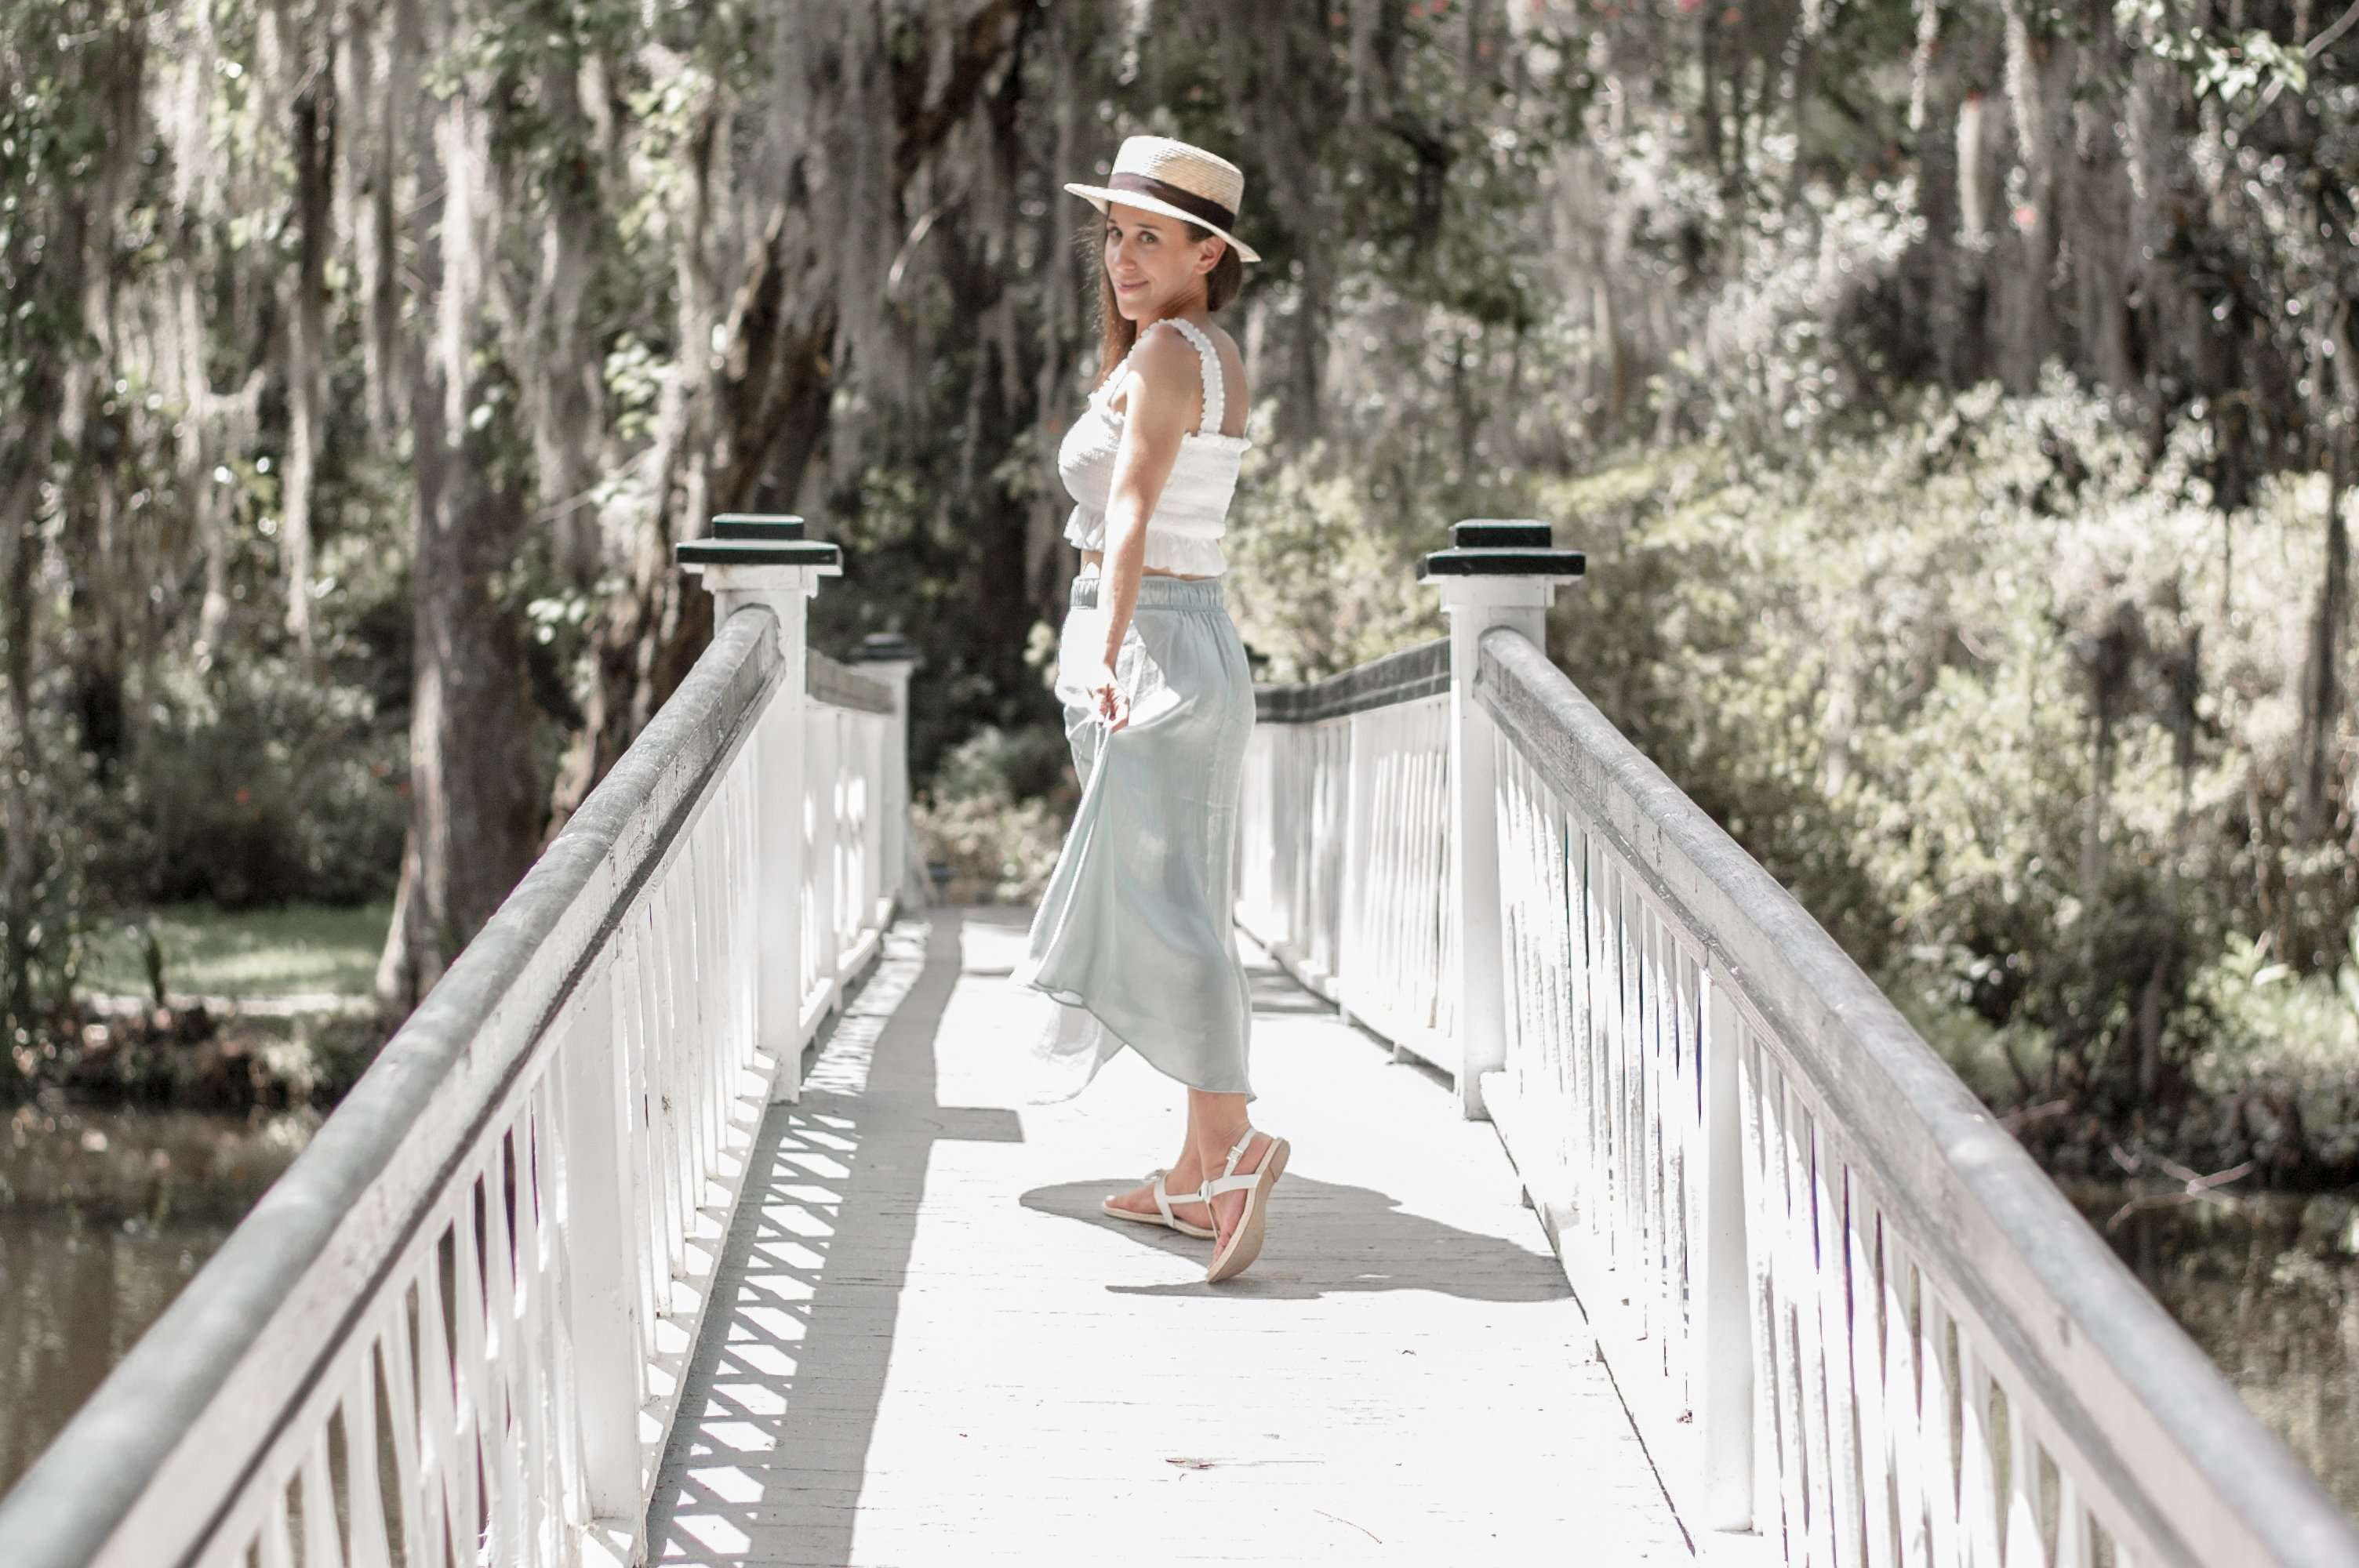 Crossing the Footbridge at Magnolia Plantation